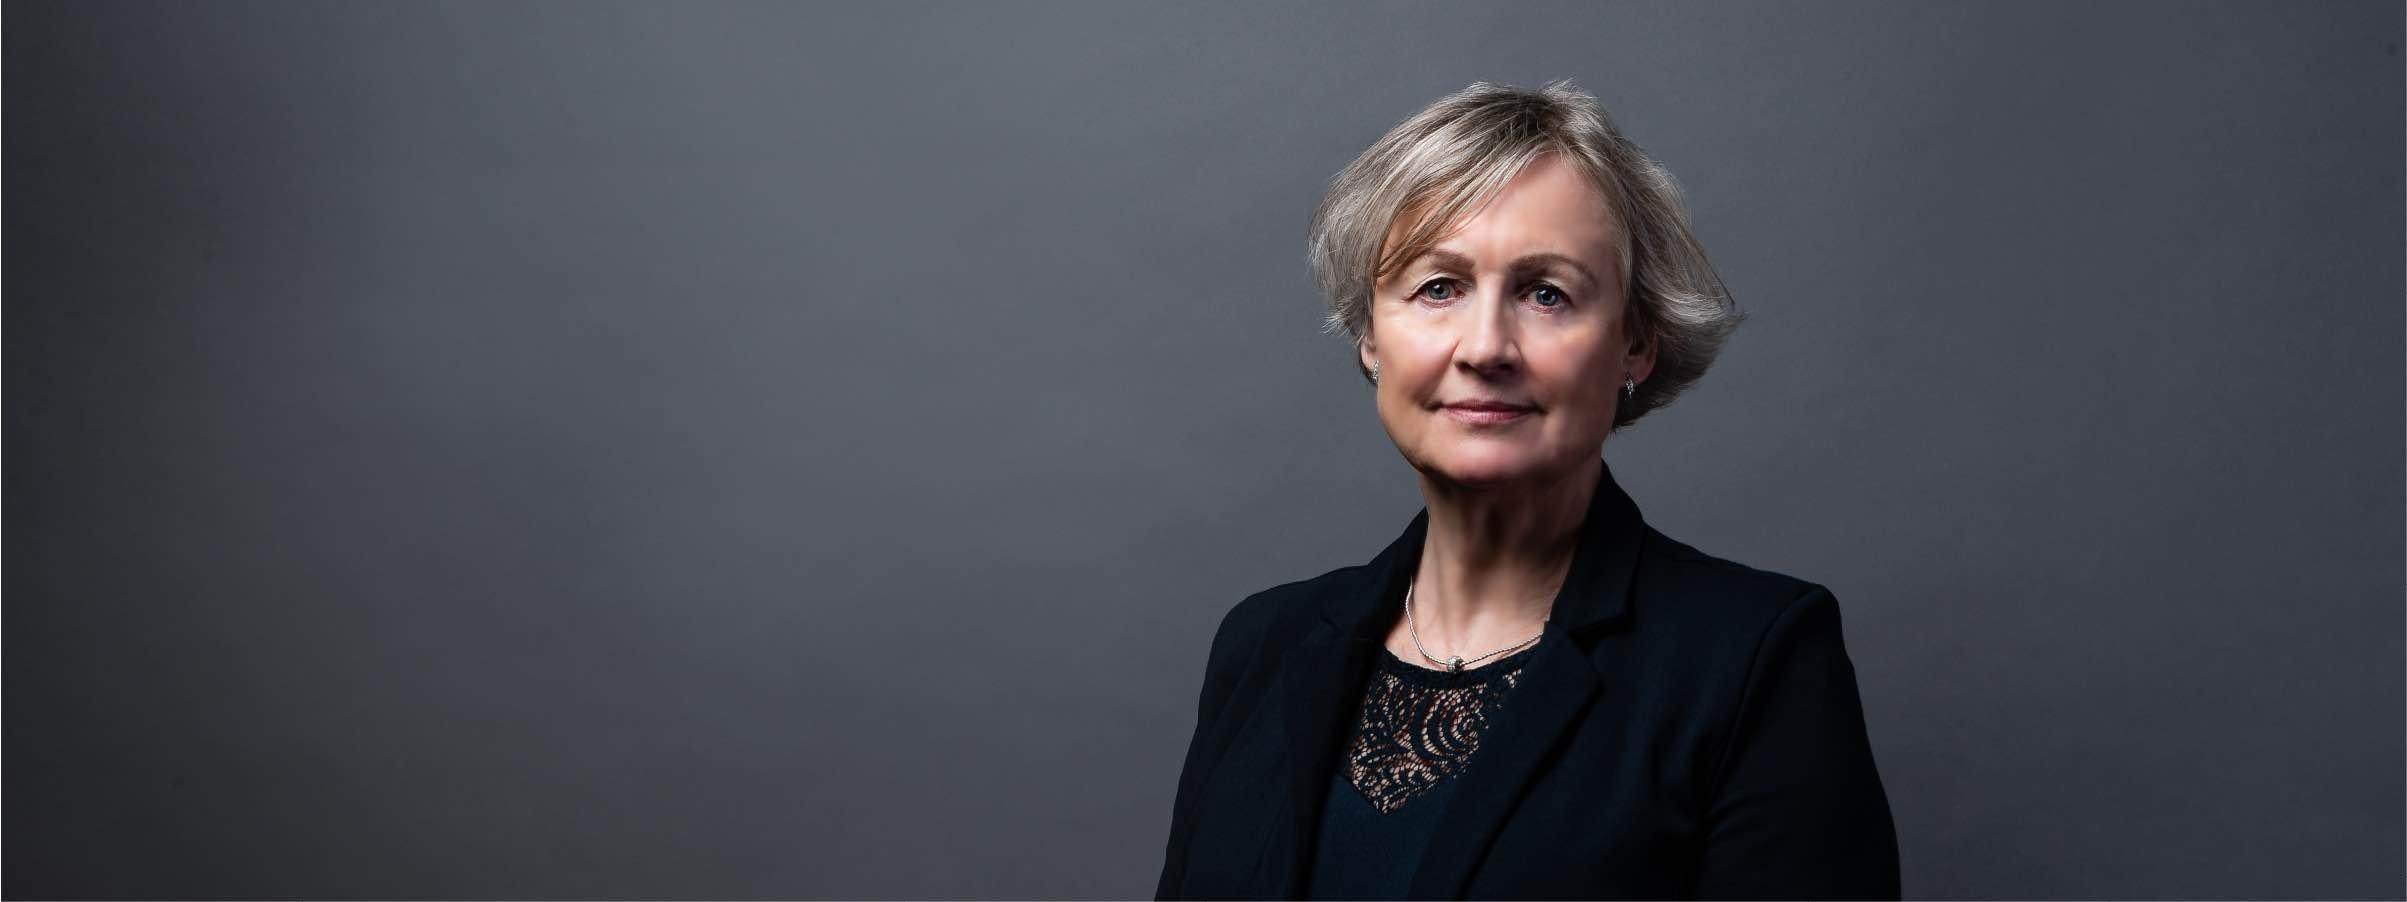 Valeurs konsulent Hanne. Karriere hos Valeur.